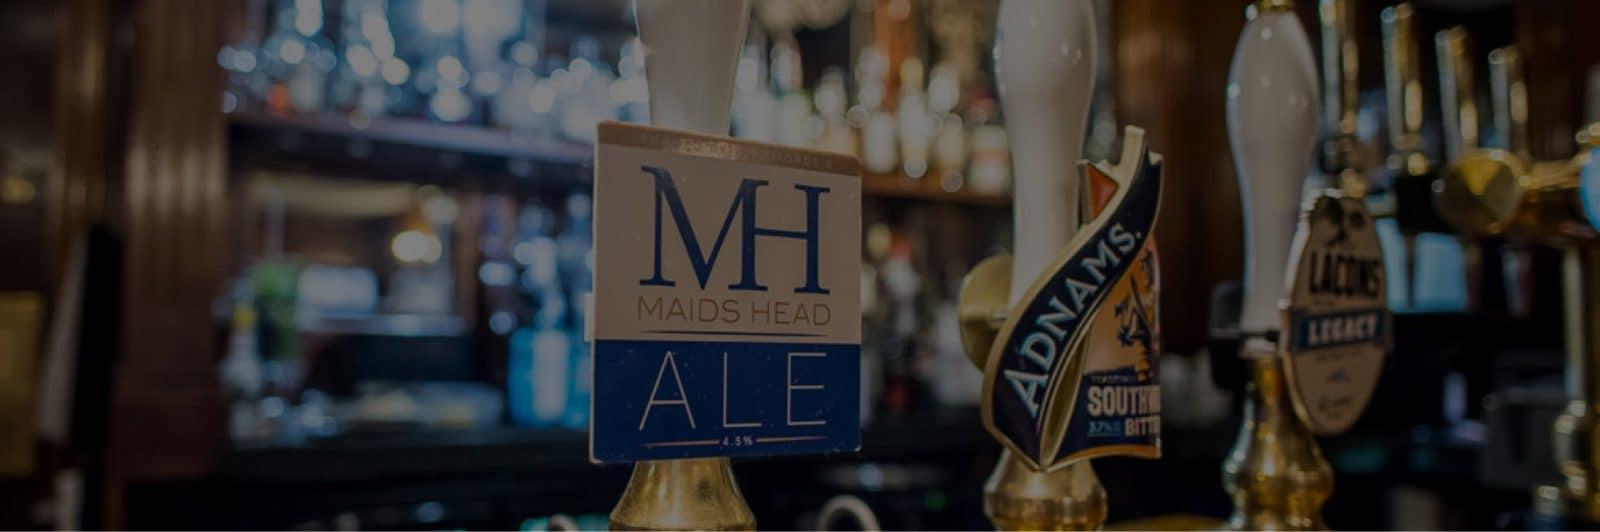 A pump serving Maids Head Ale at the Maids Head Bar